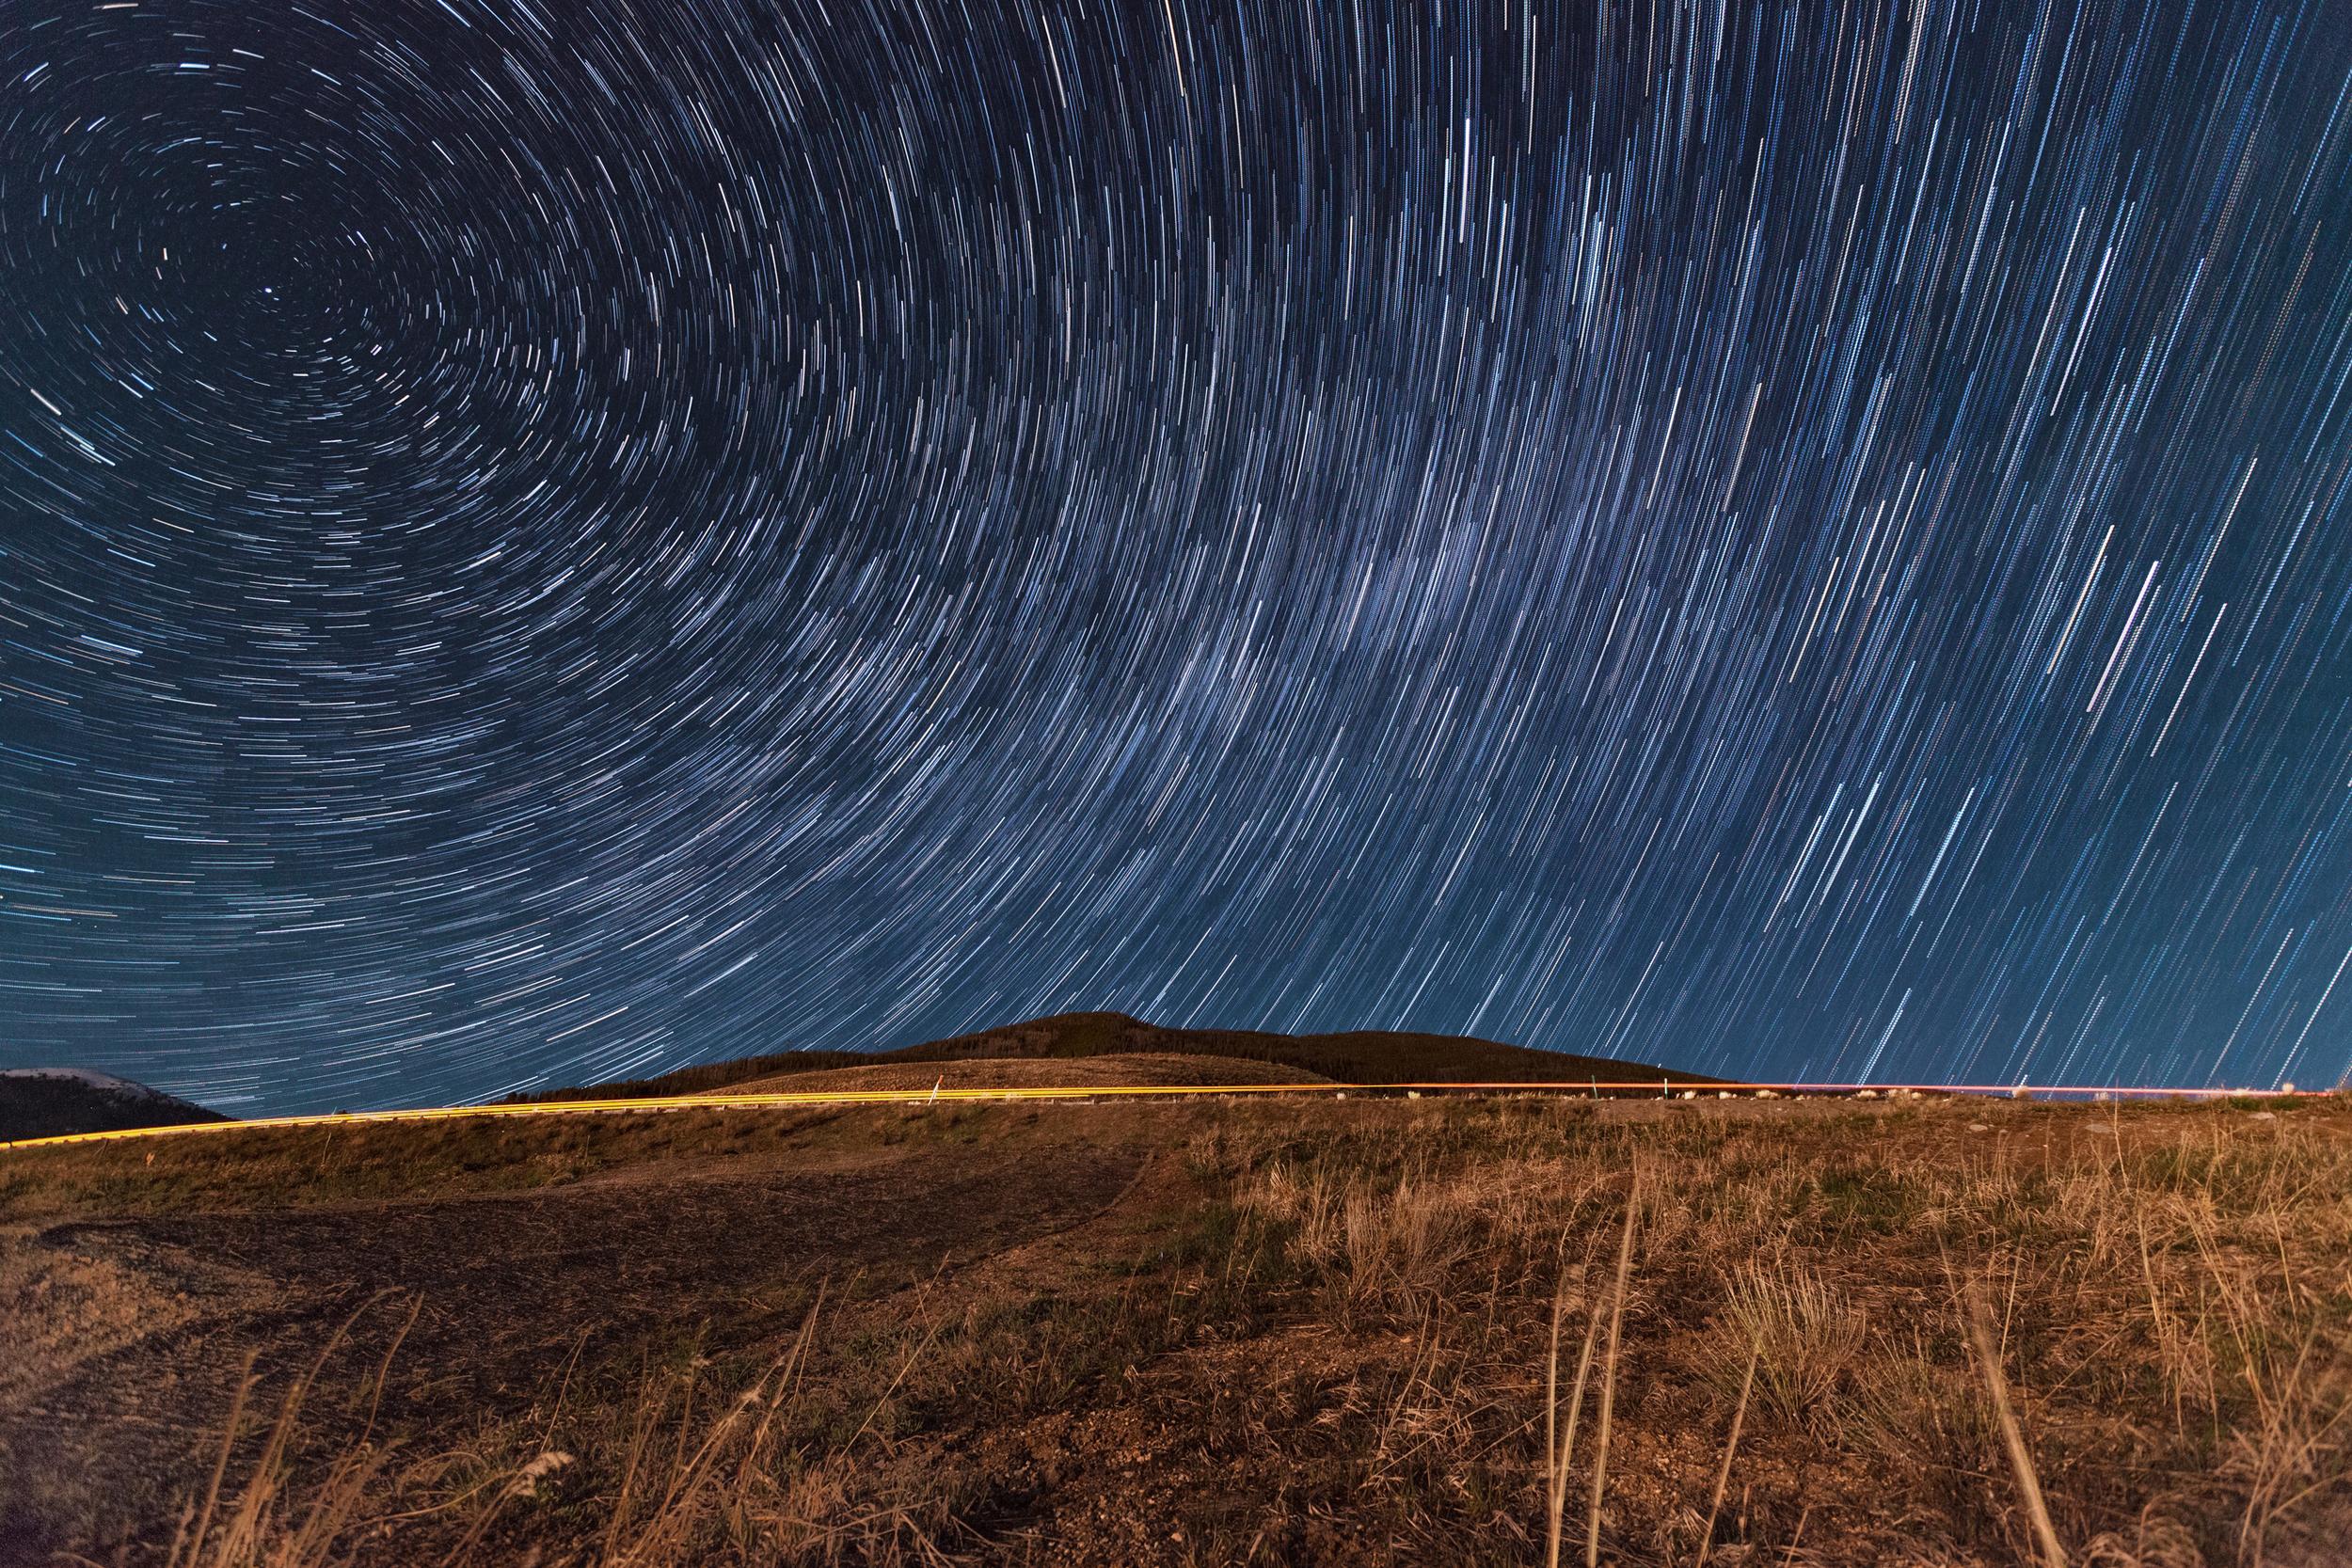 StarStaX_ColoradoDay2_lighten_lores.jpg